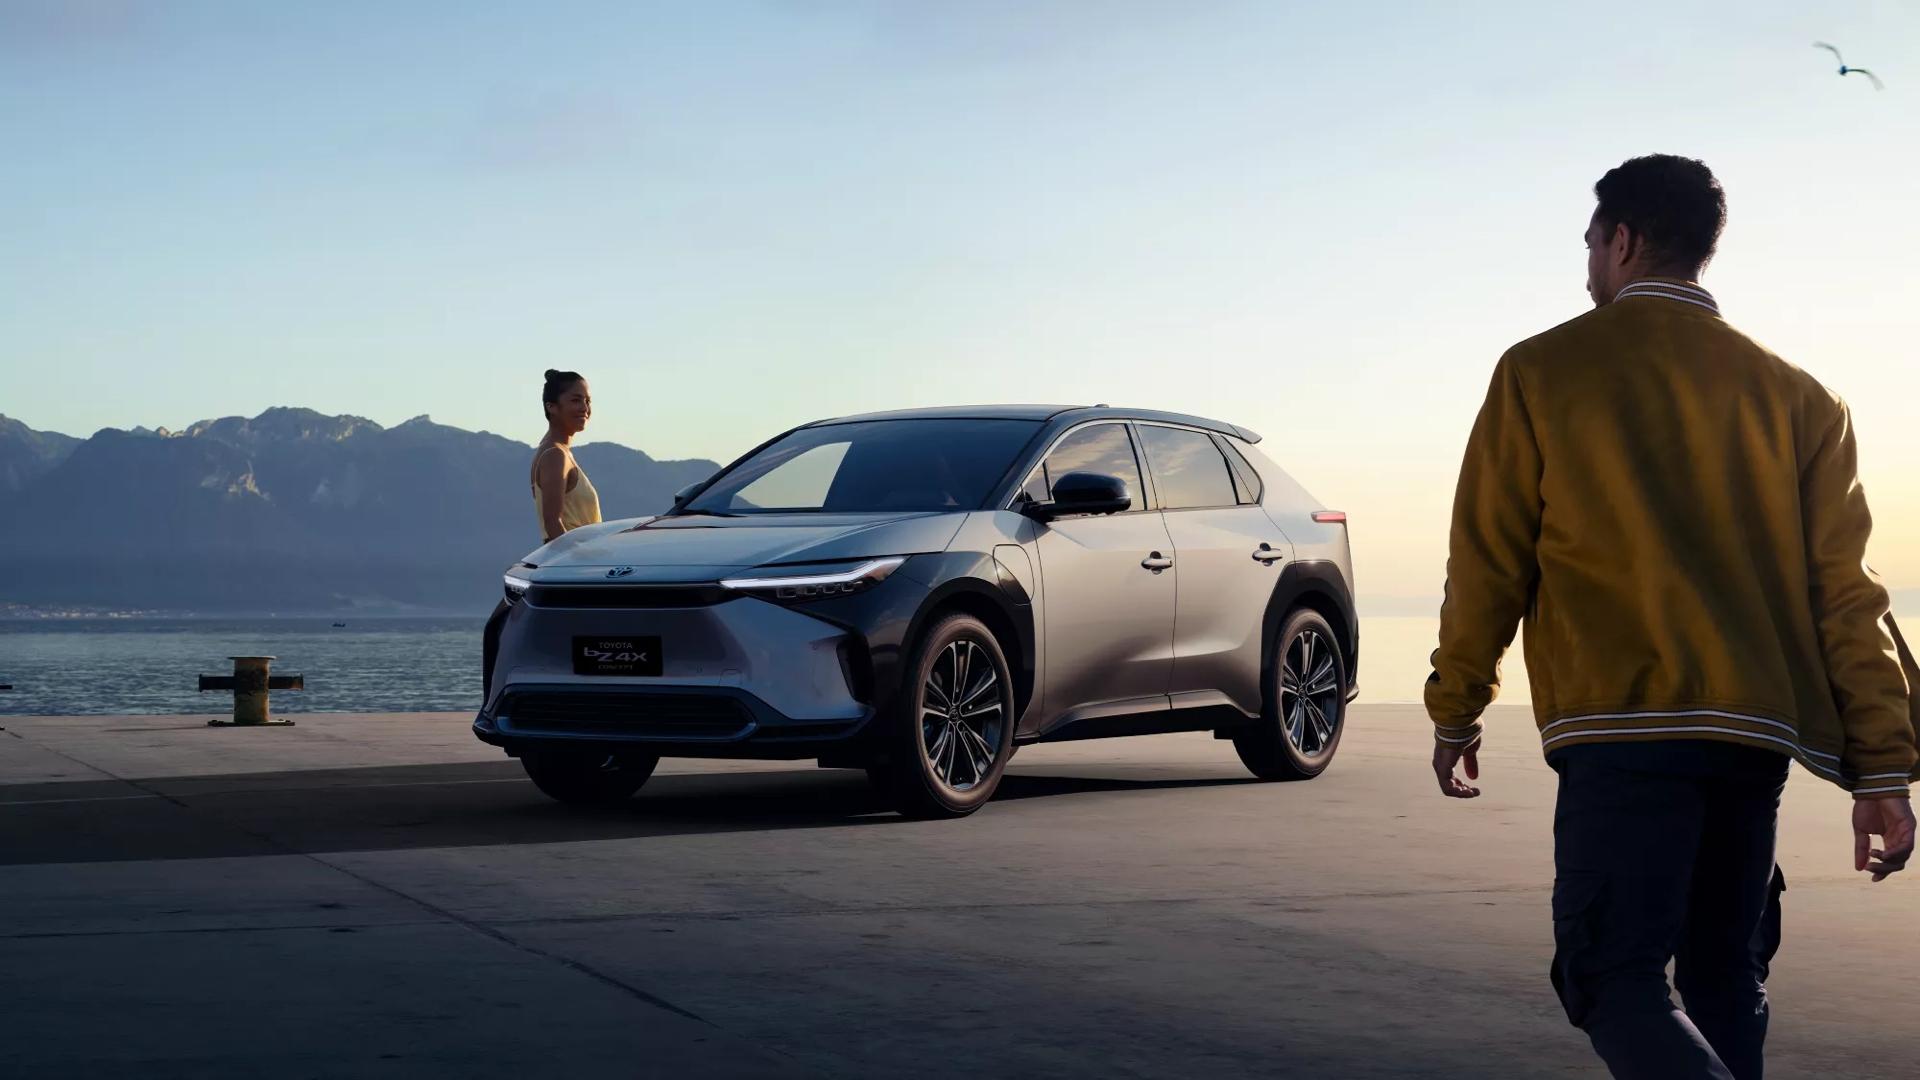 Toyota bZ4X Concept Elbilar 2022